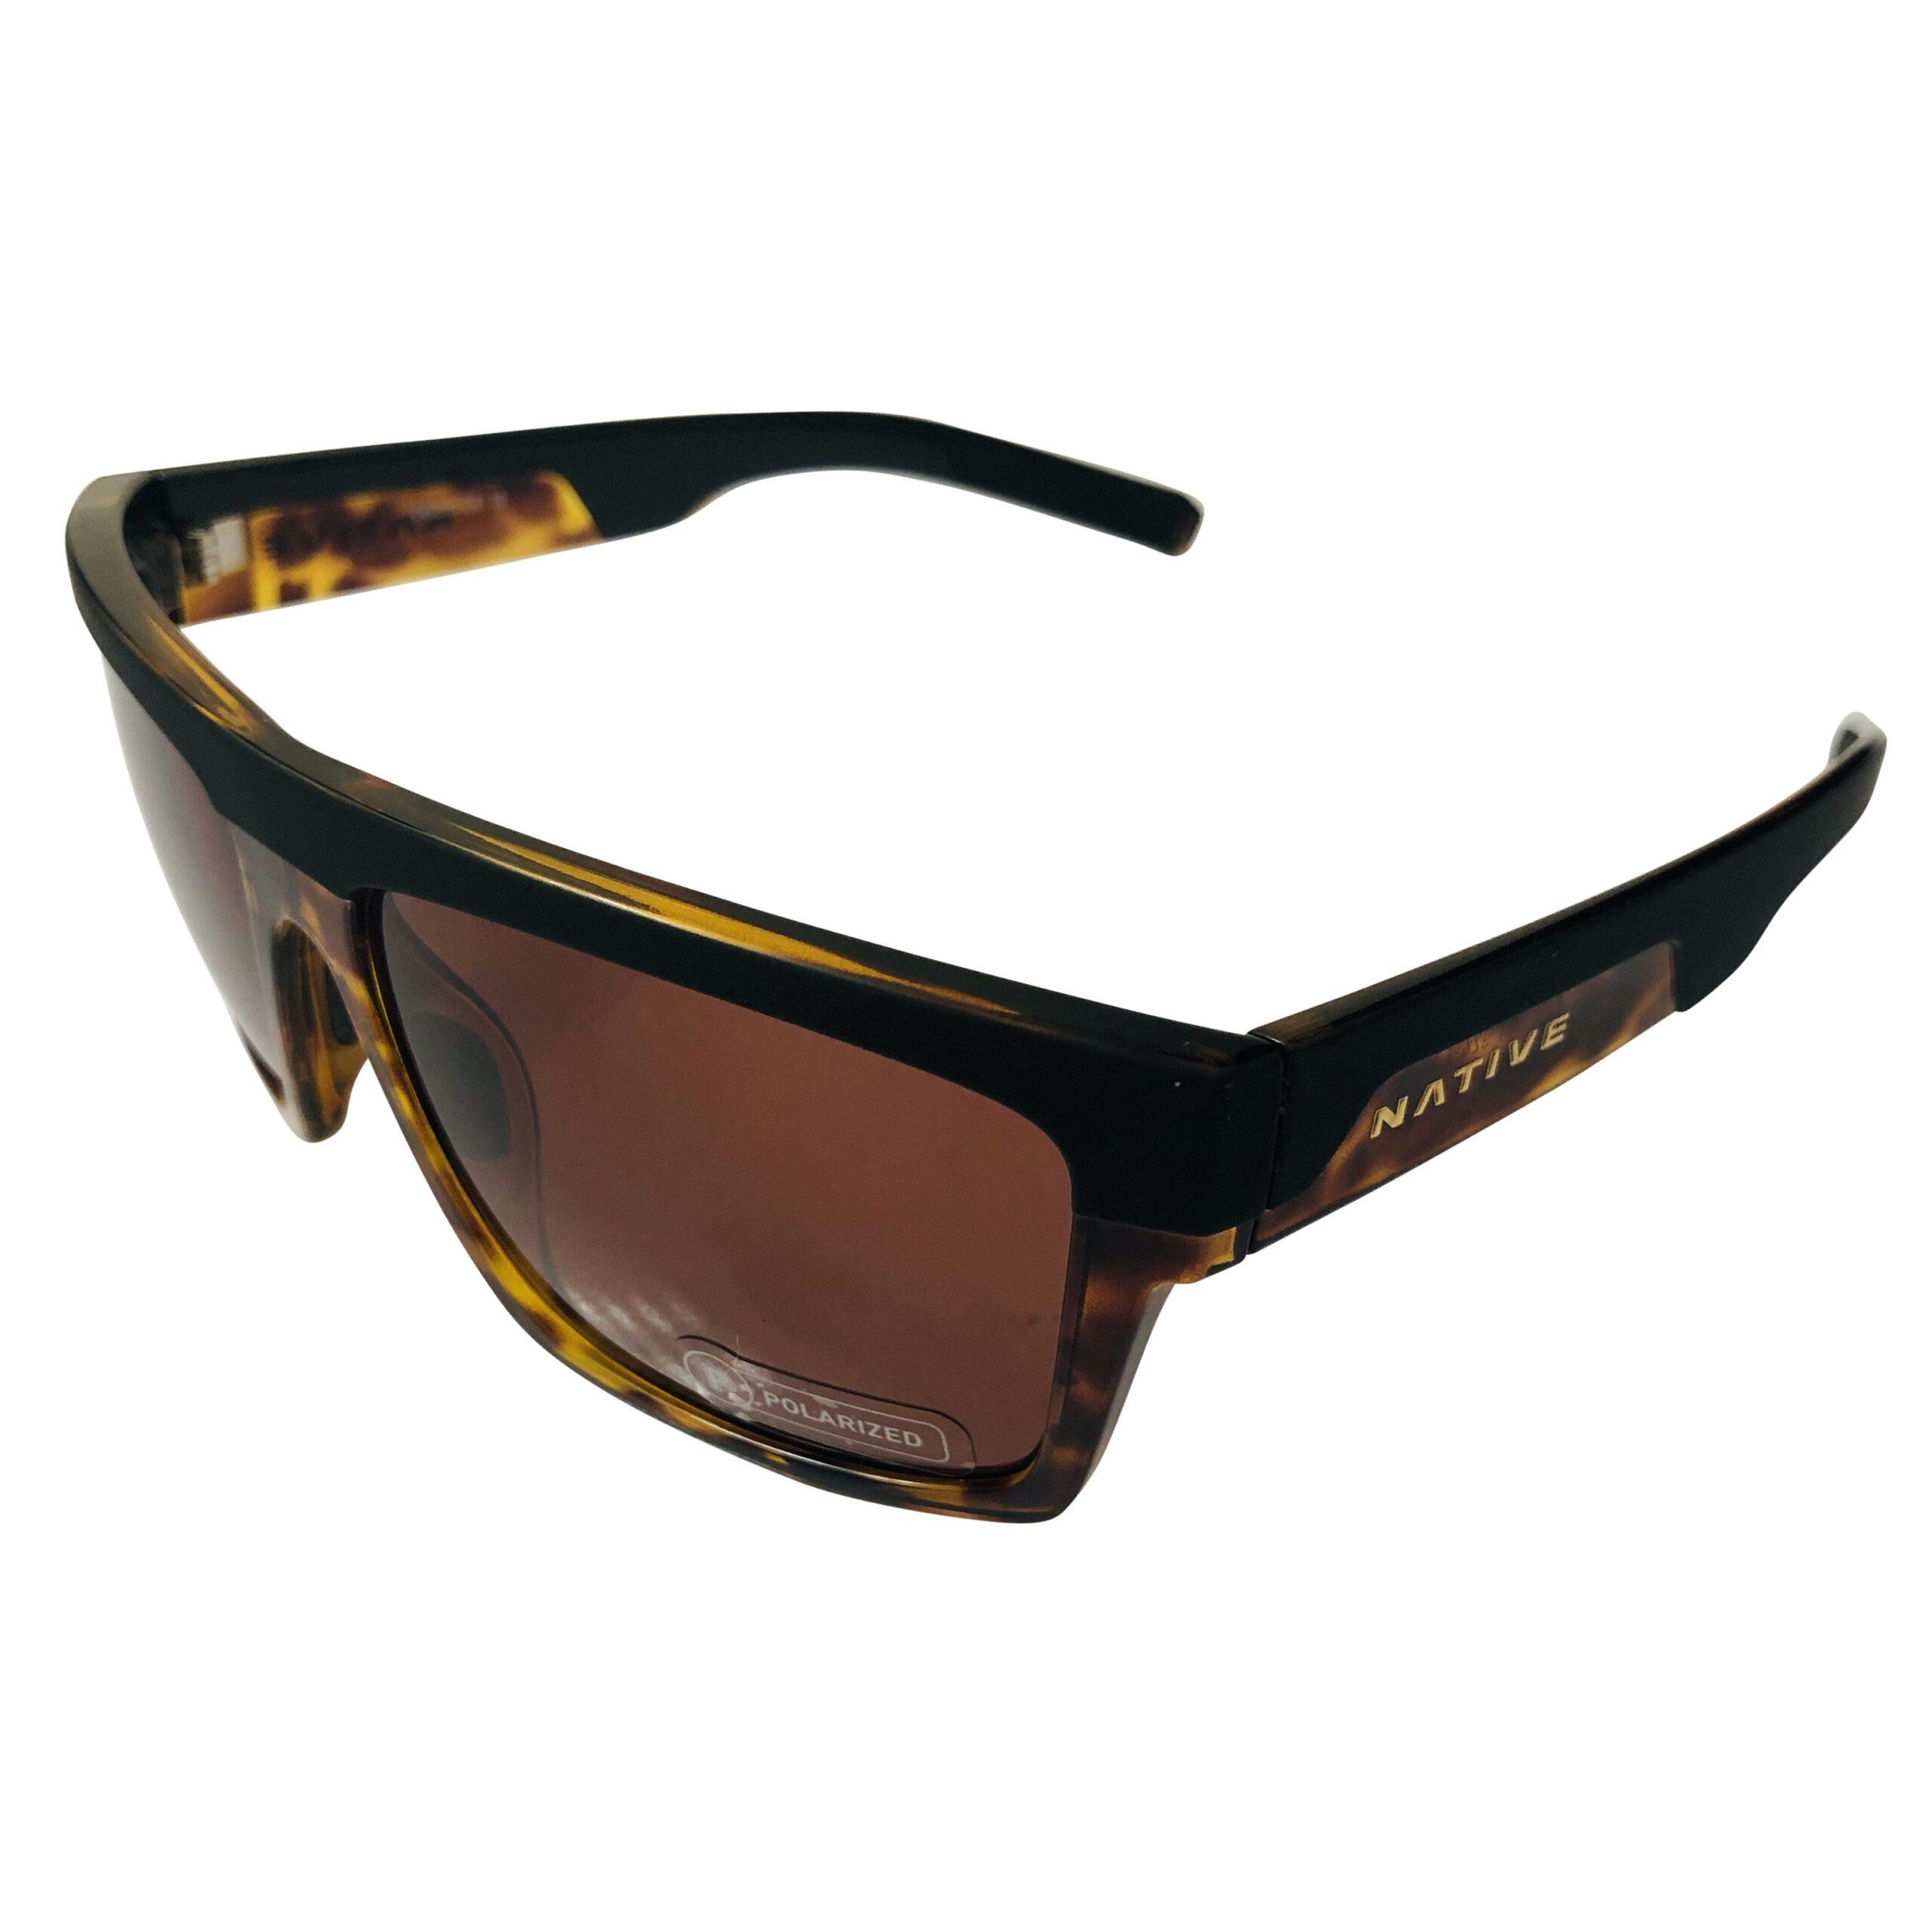 Native Eyewear El Jefe Sunglasses - Matte Black w/ Tortoise POLARIZED Brown